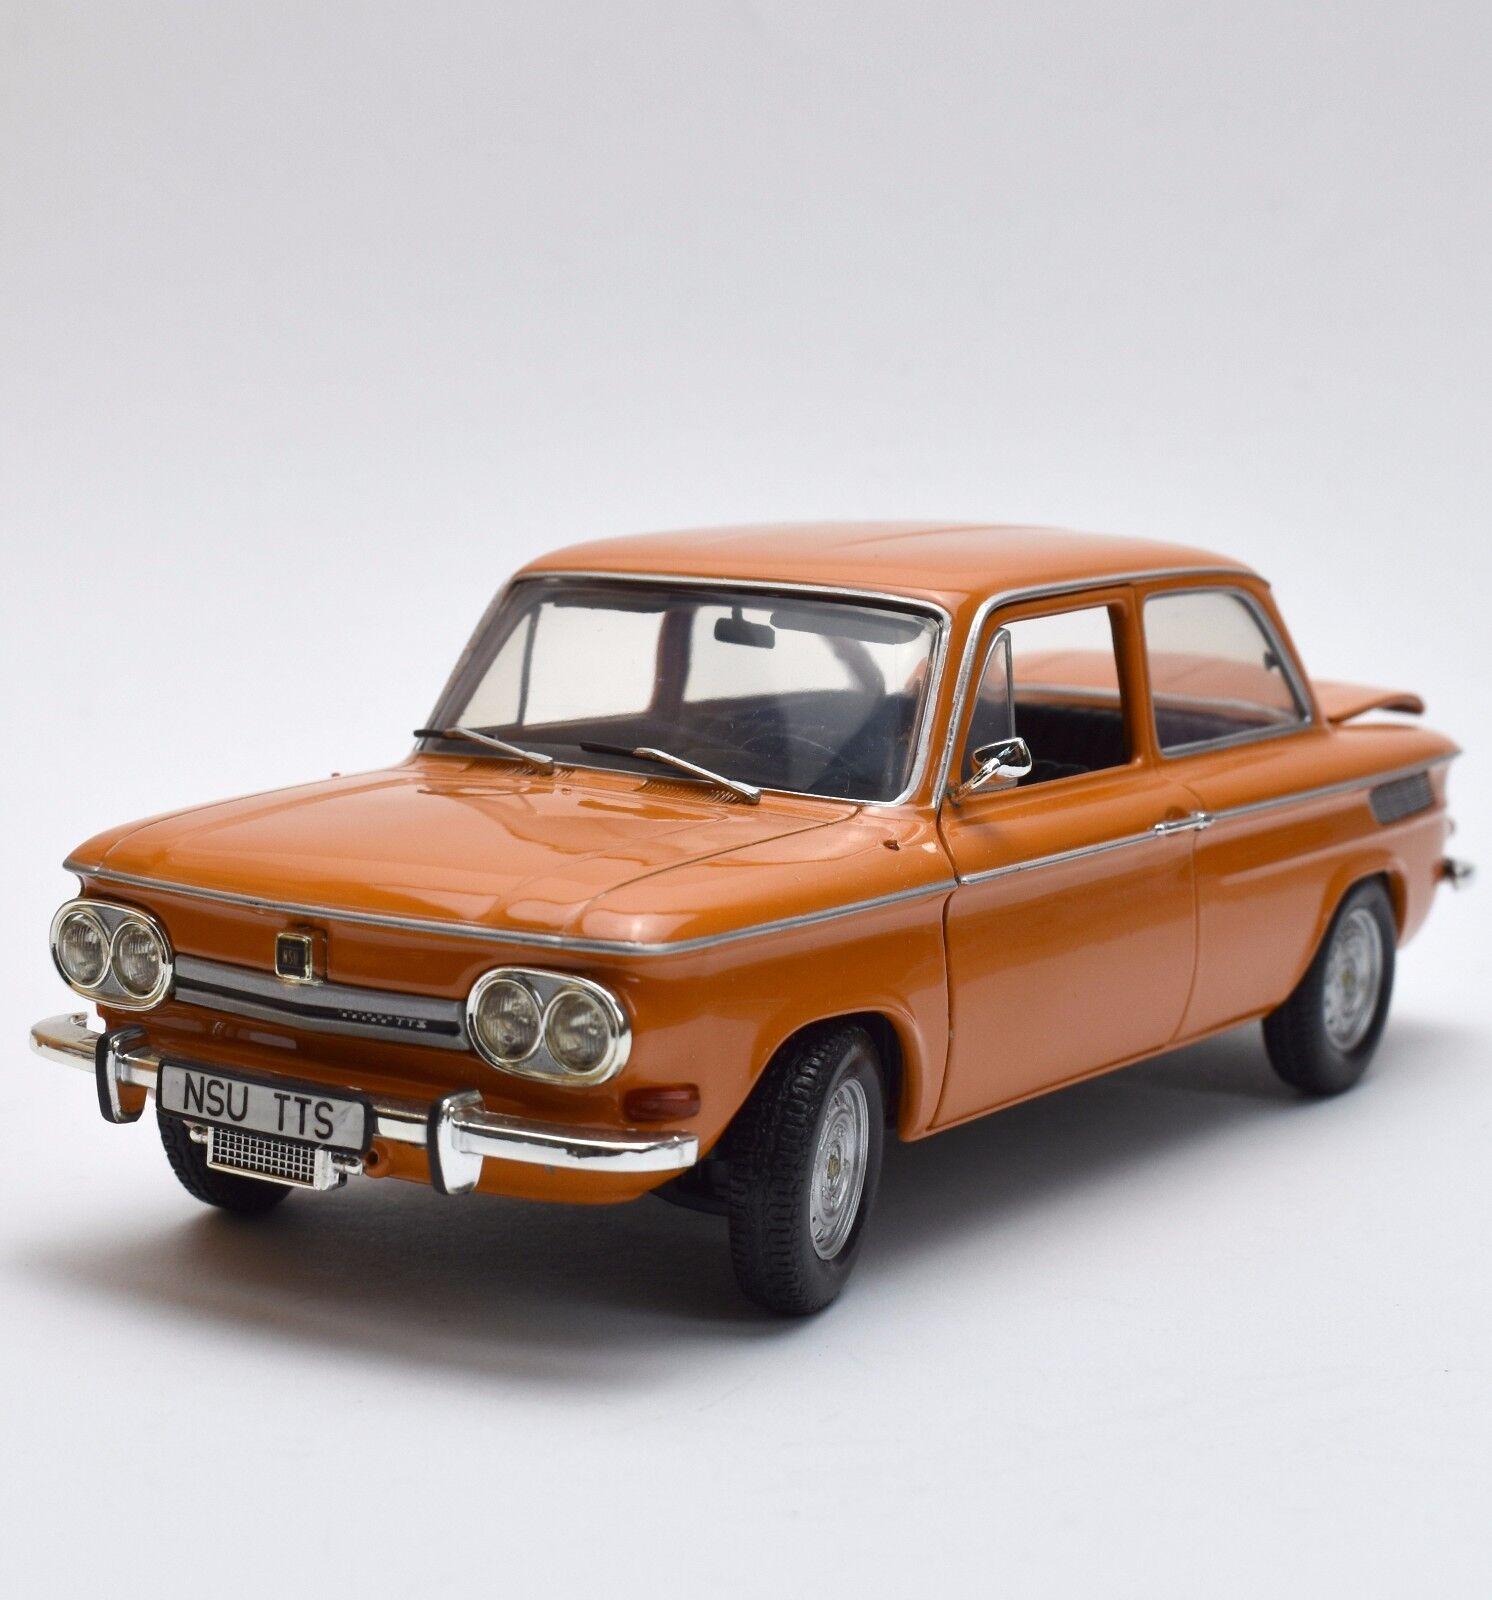 Revell 08413 NSU TTS príncipe Sport Coupe en arancia lacados, 1 18, embalaje original, k060